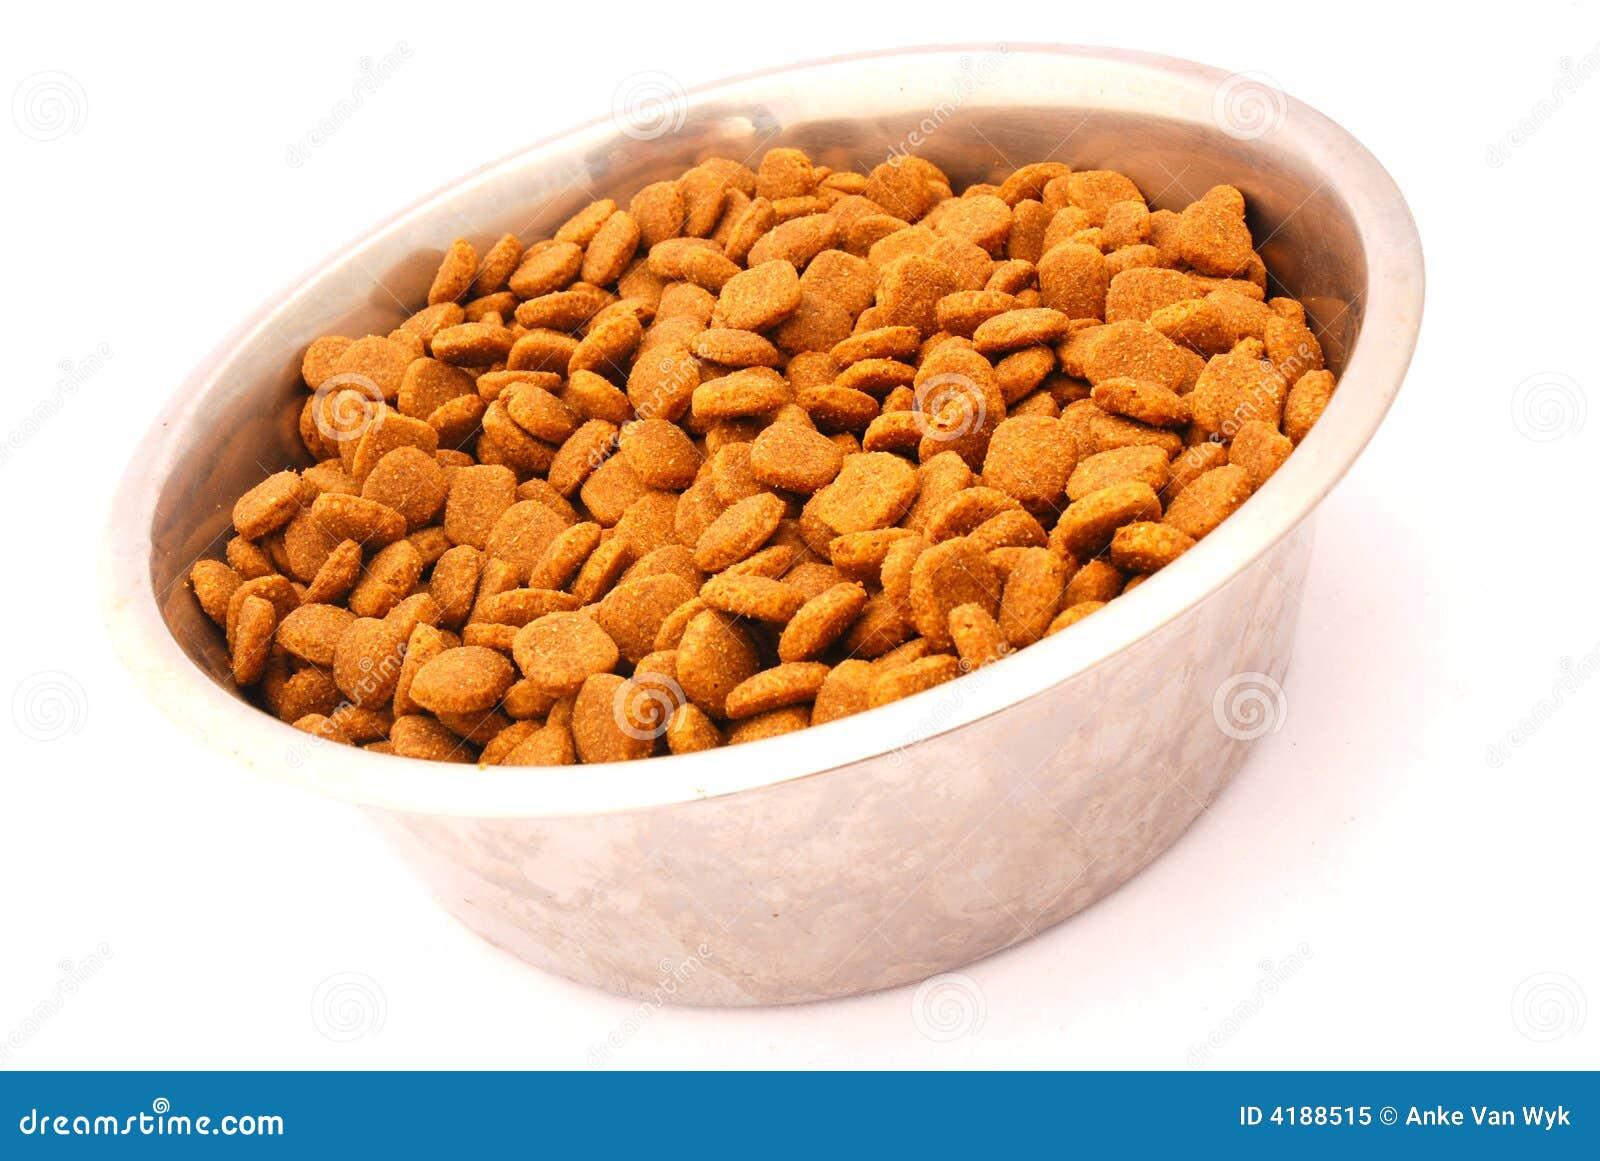 Raw Dry Dog Food